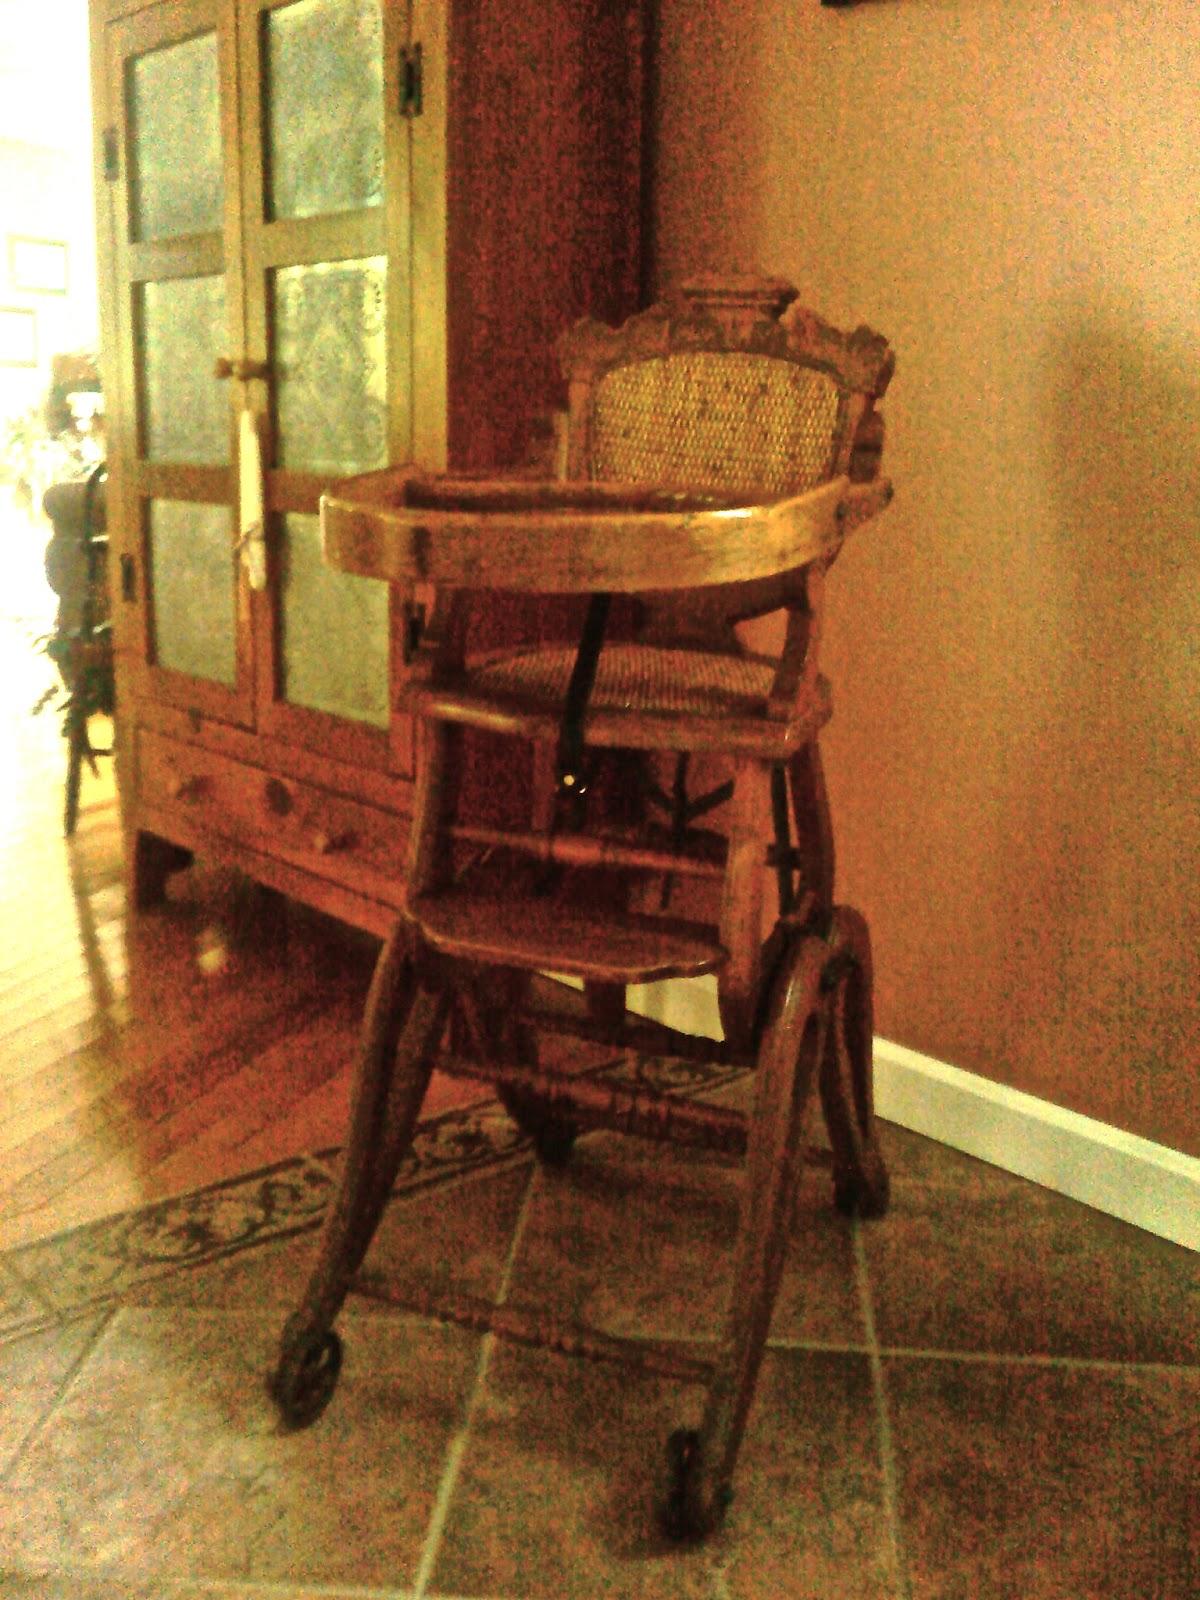 Child's High Chair / Rocker - Antique Treasures: Child's High Chair / Rocker